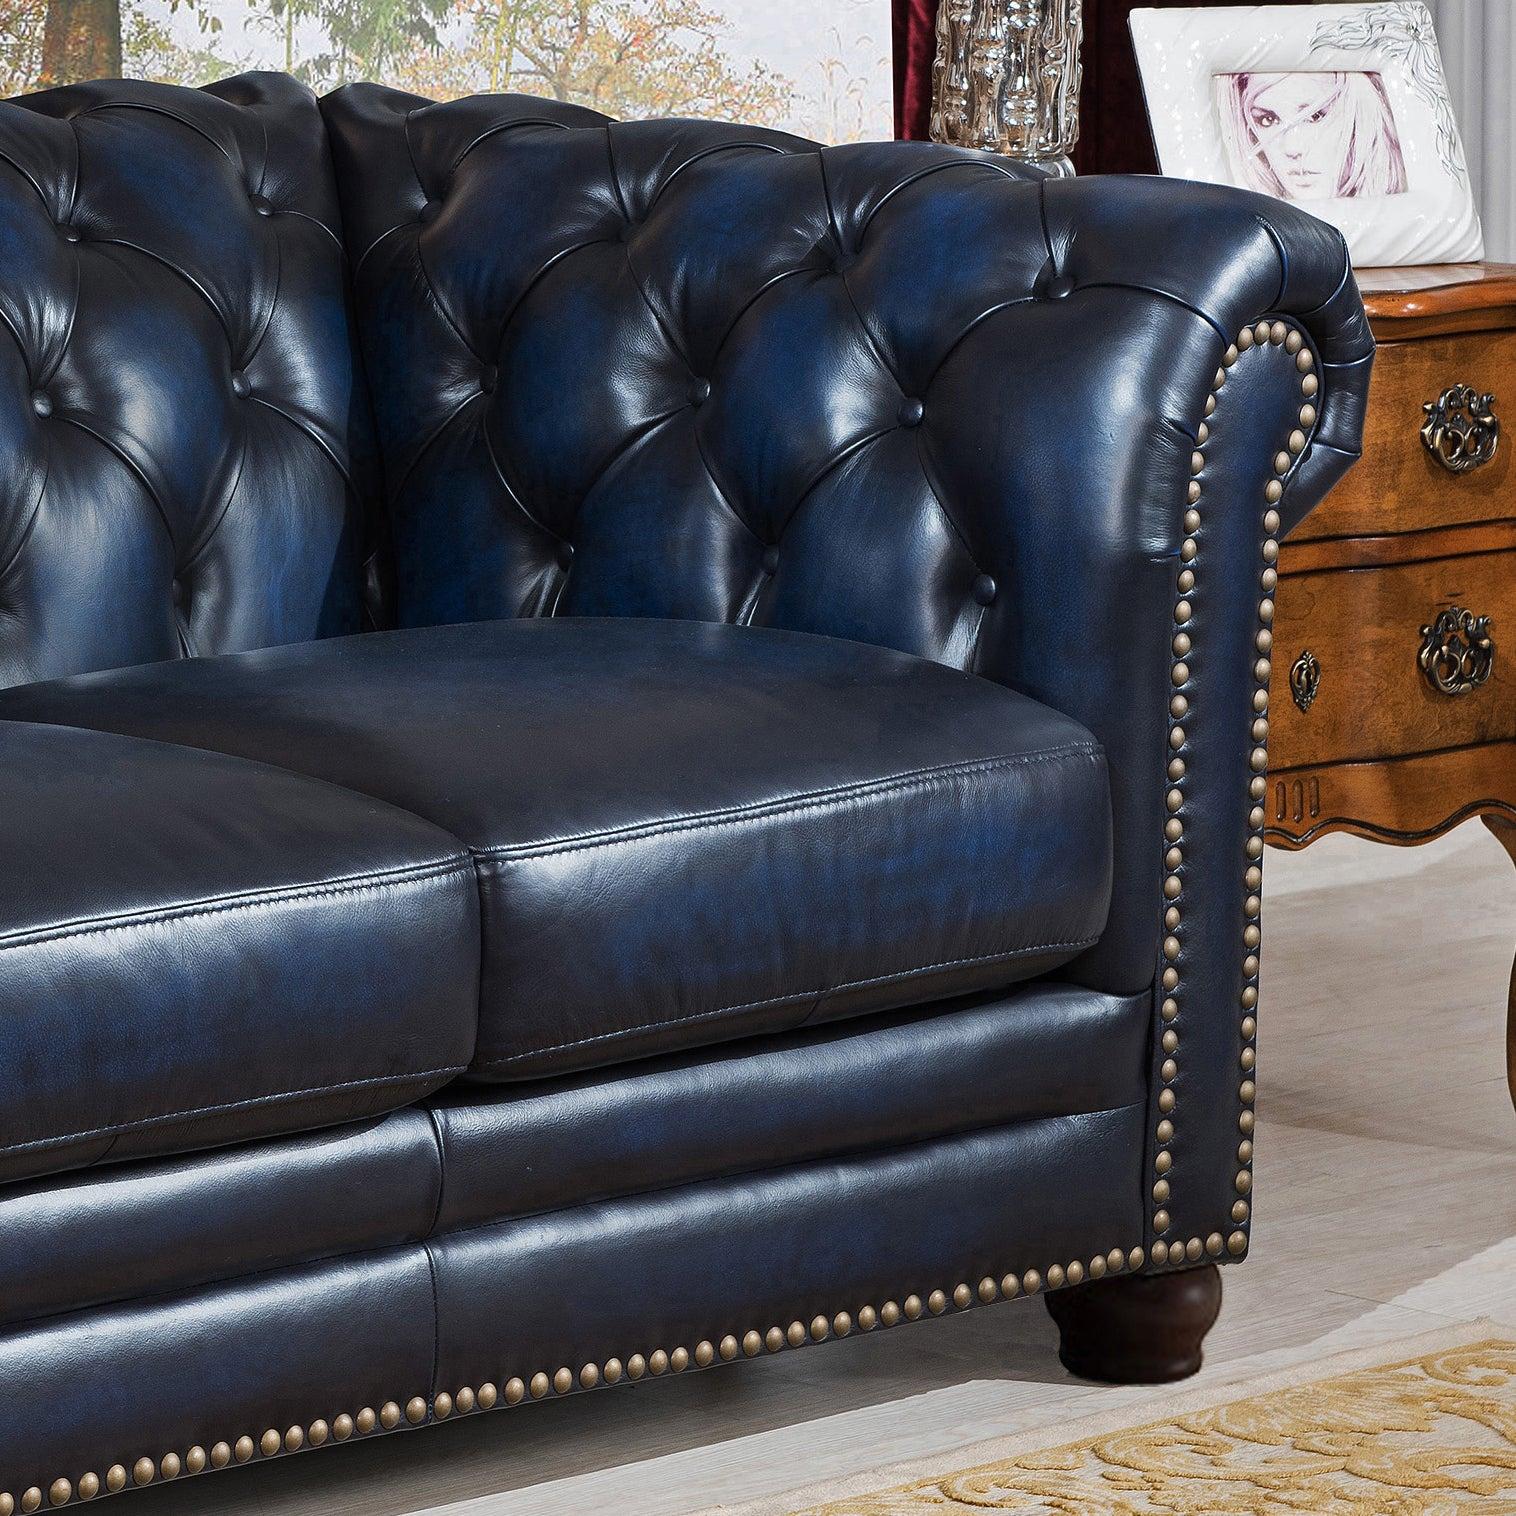 Blue Chesterfield Leather Sofa Nebraska Tufted Genuine ...